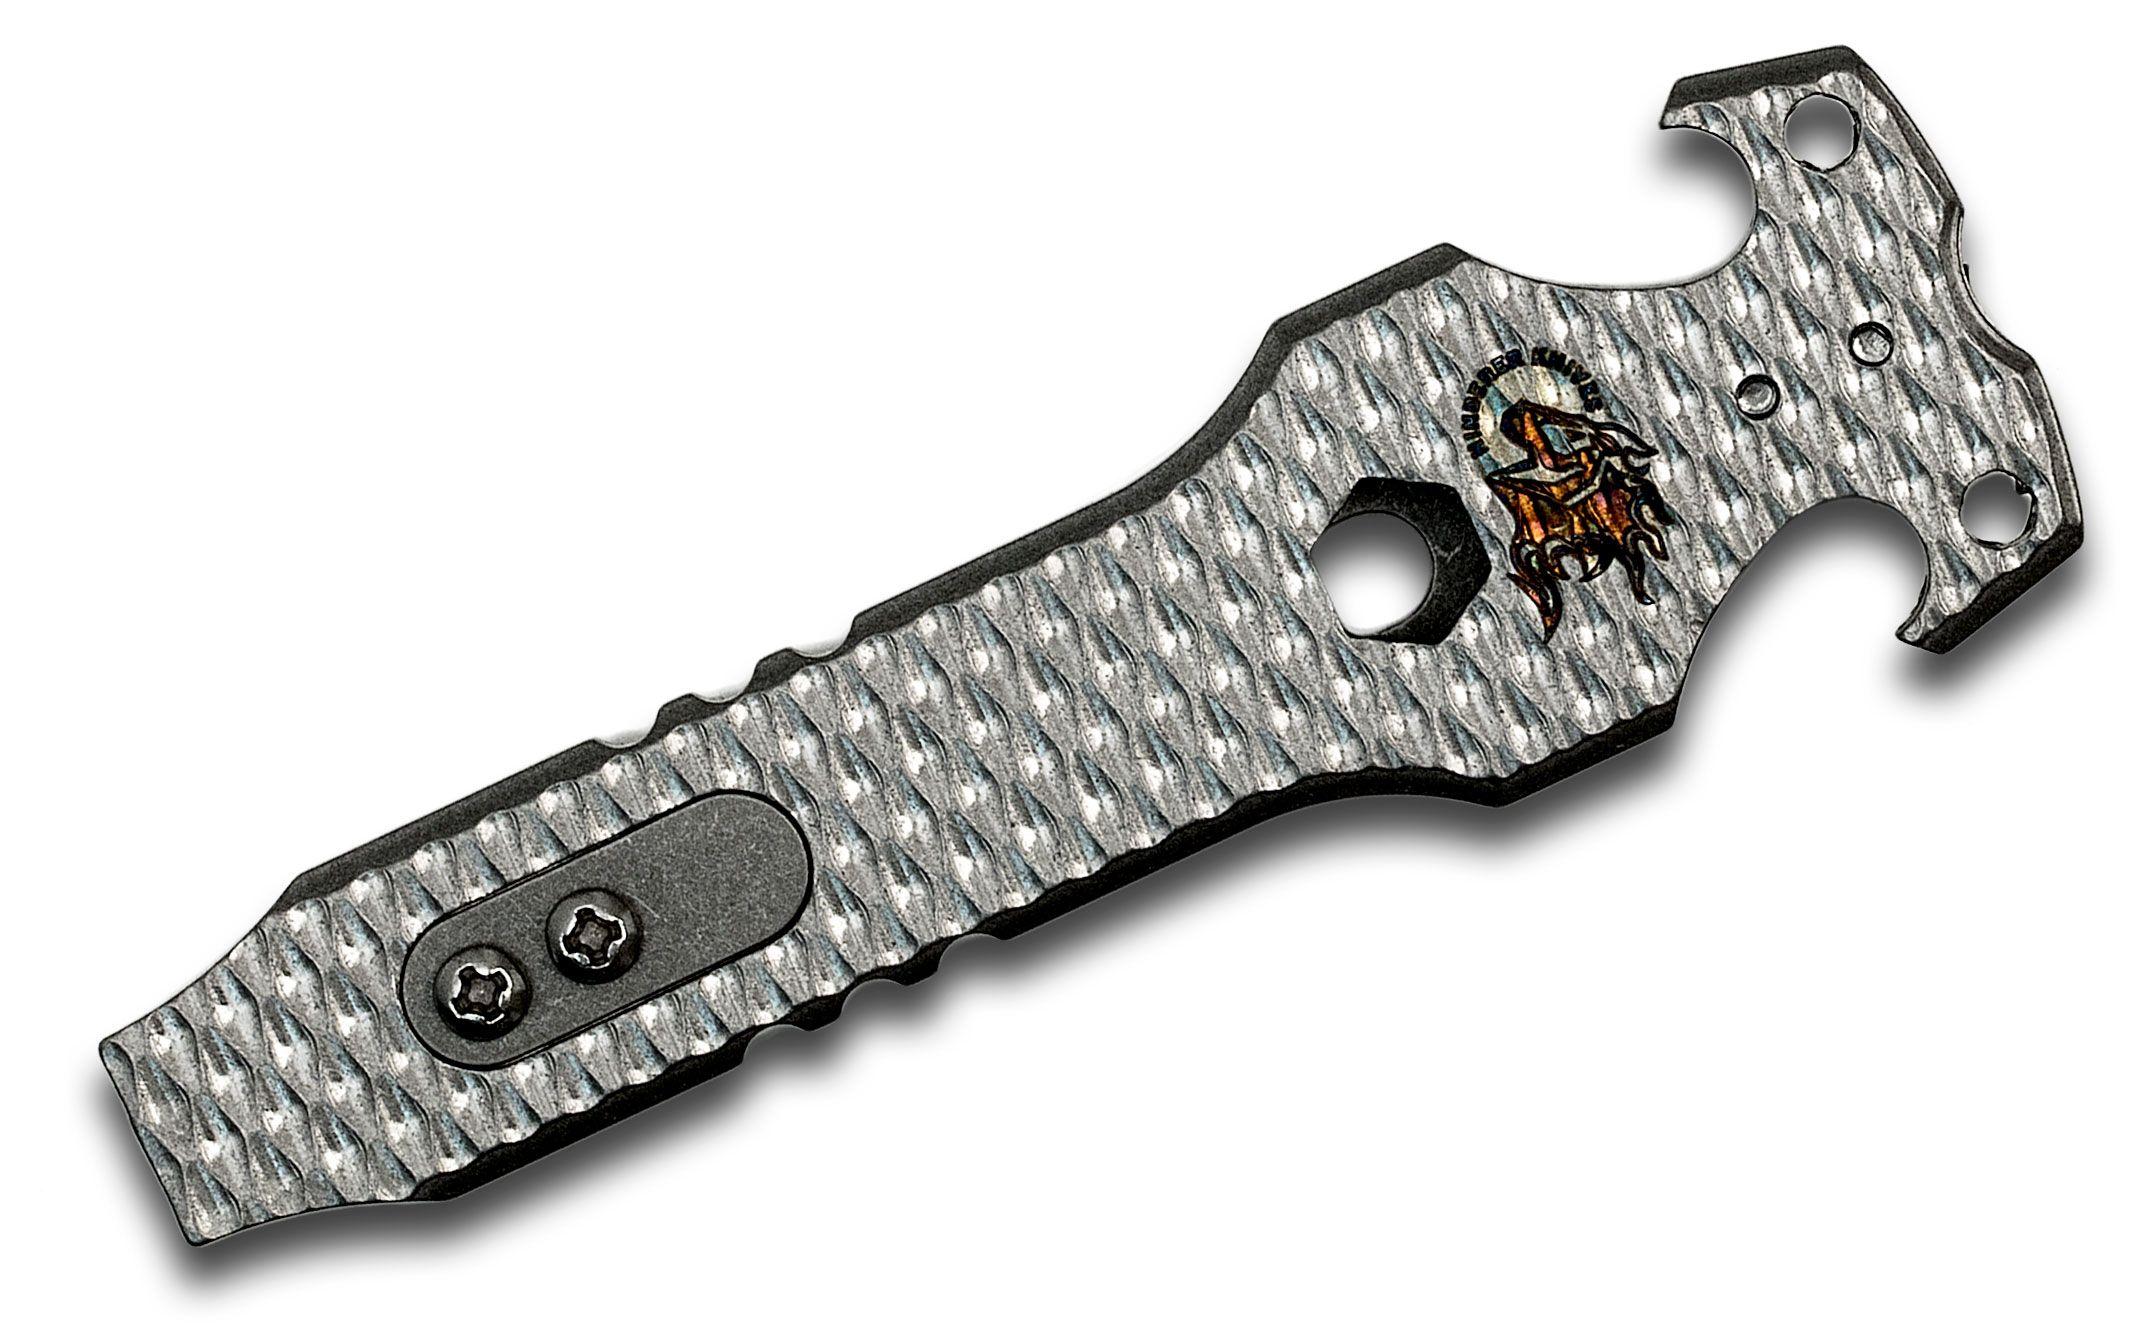 Rick Hinderer Knives Stonewashed Titanium HS-Tac Tool